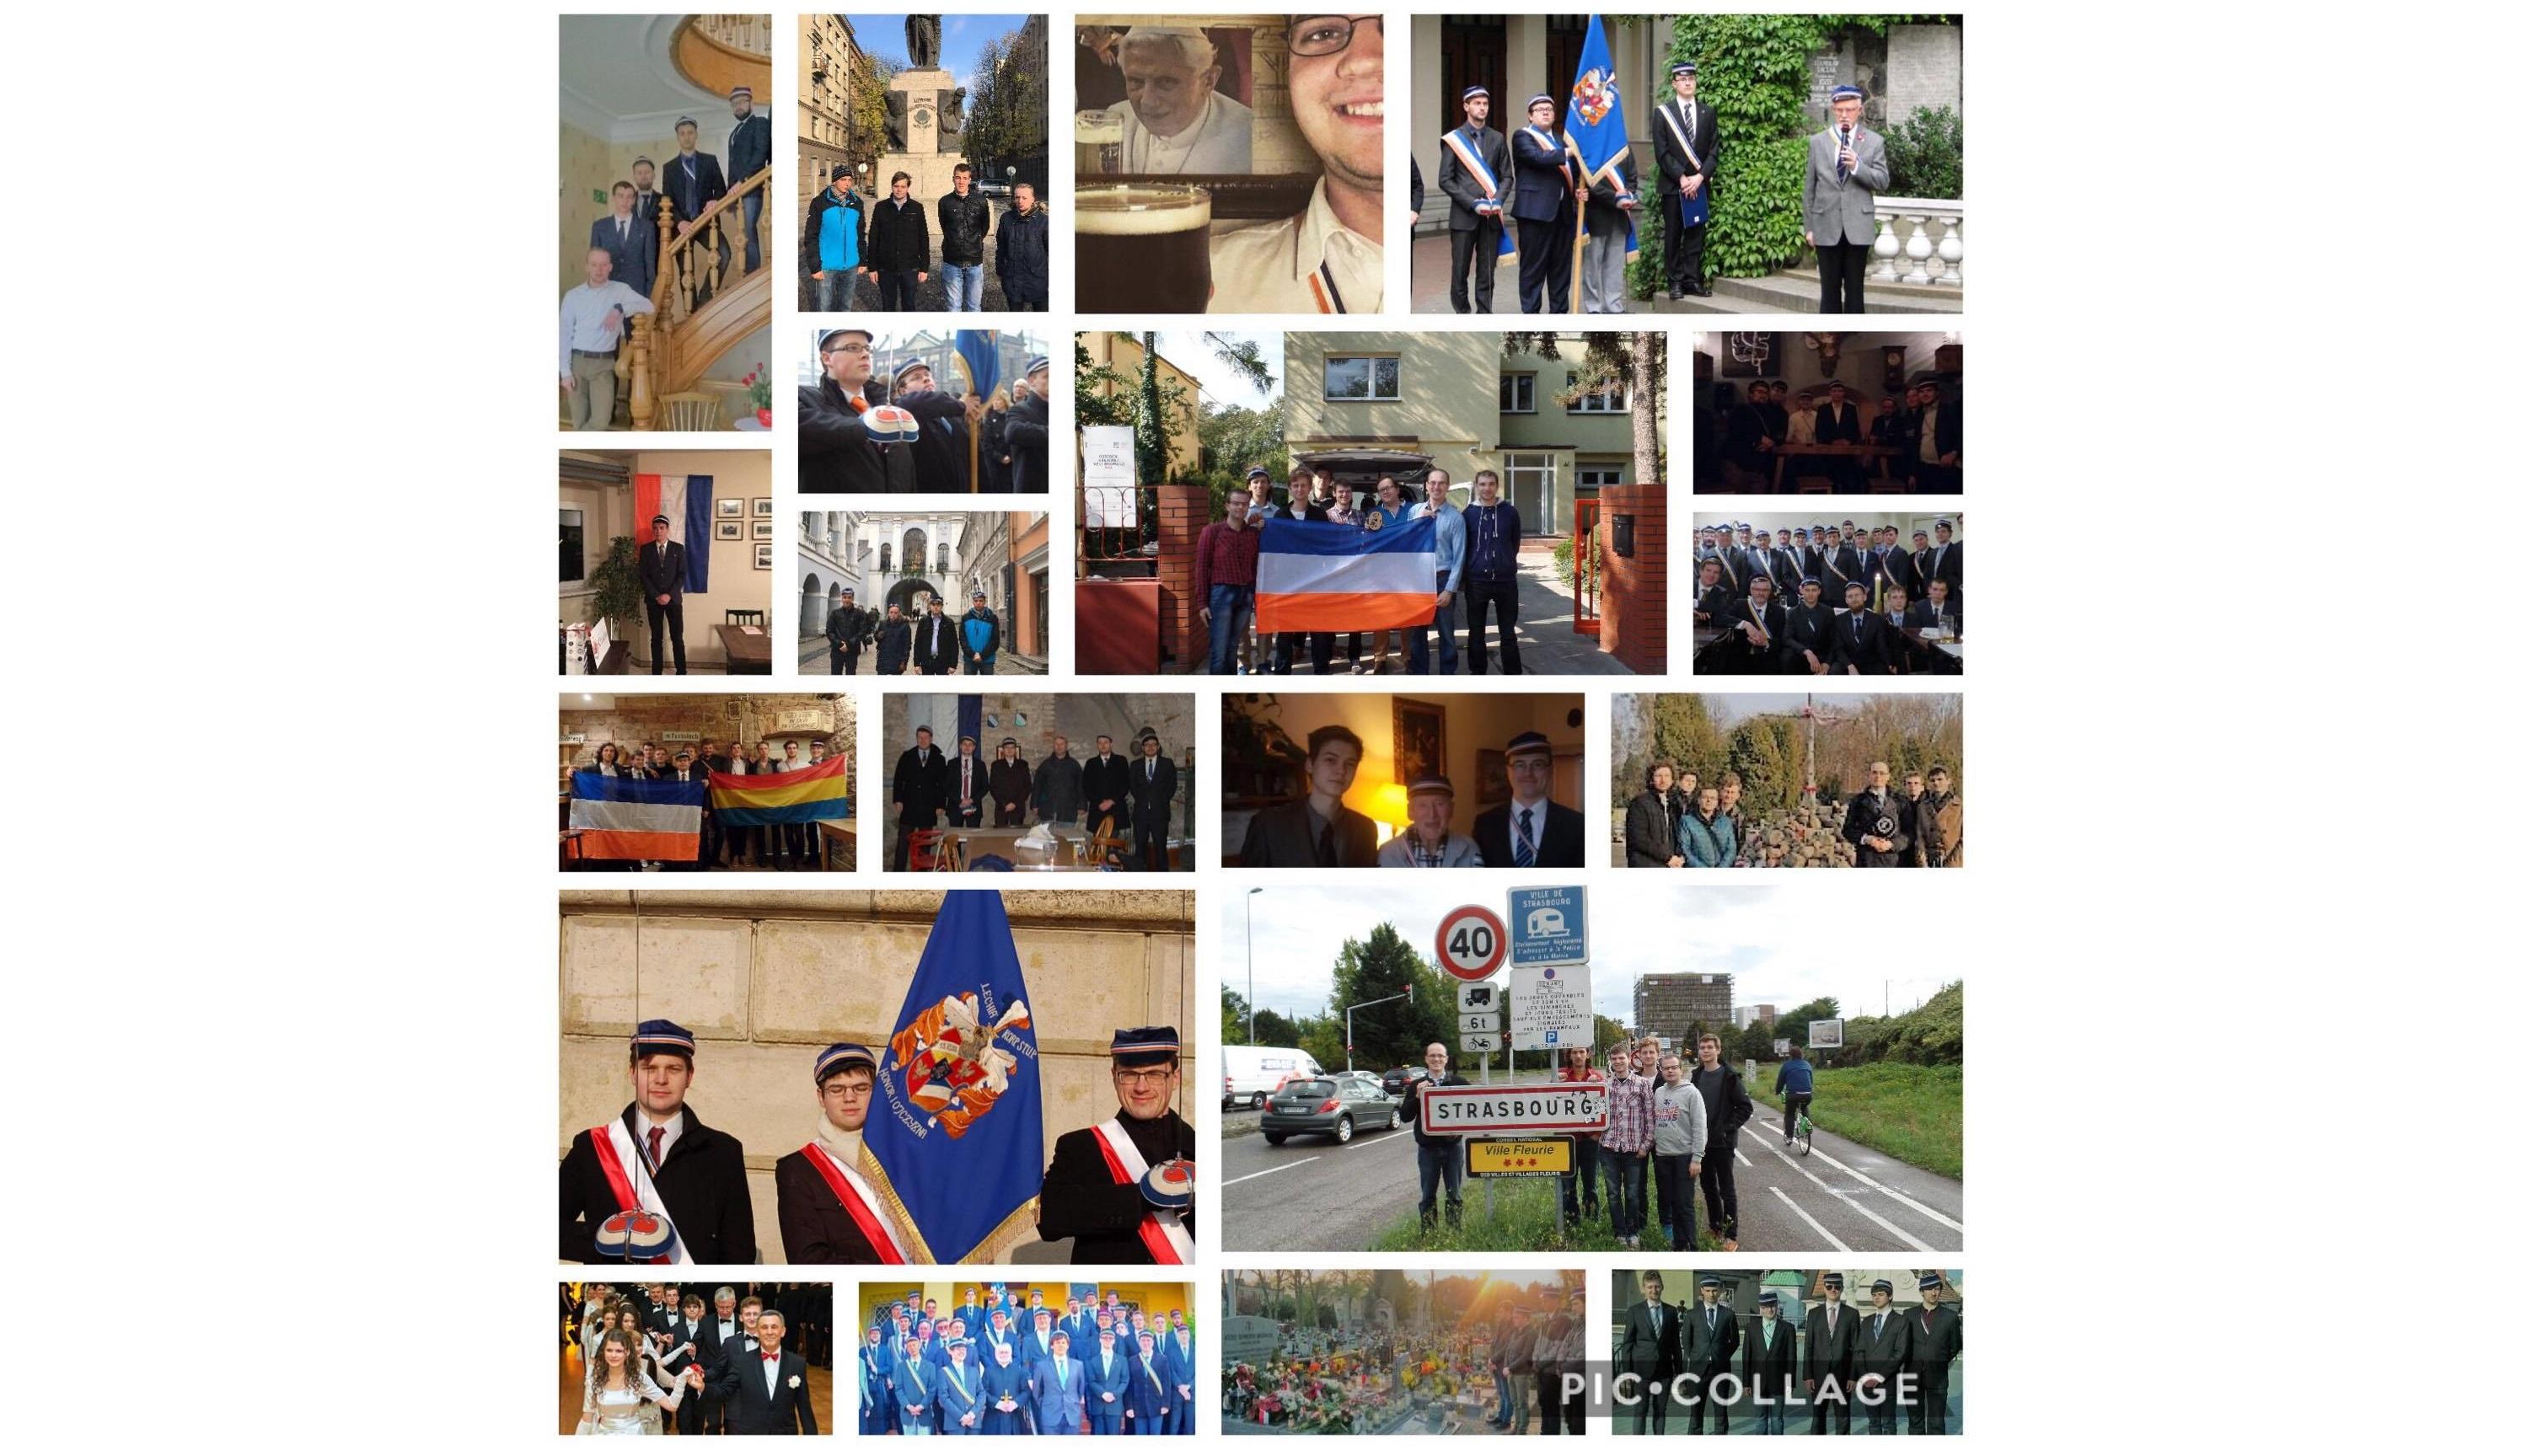 http://www.lechia.org/wp-content/uploads/2017/12/Składanka2.jpg